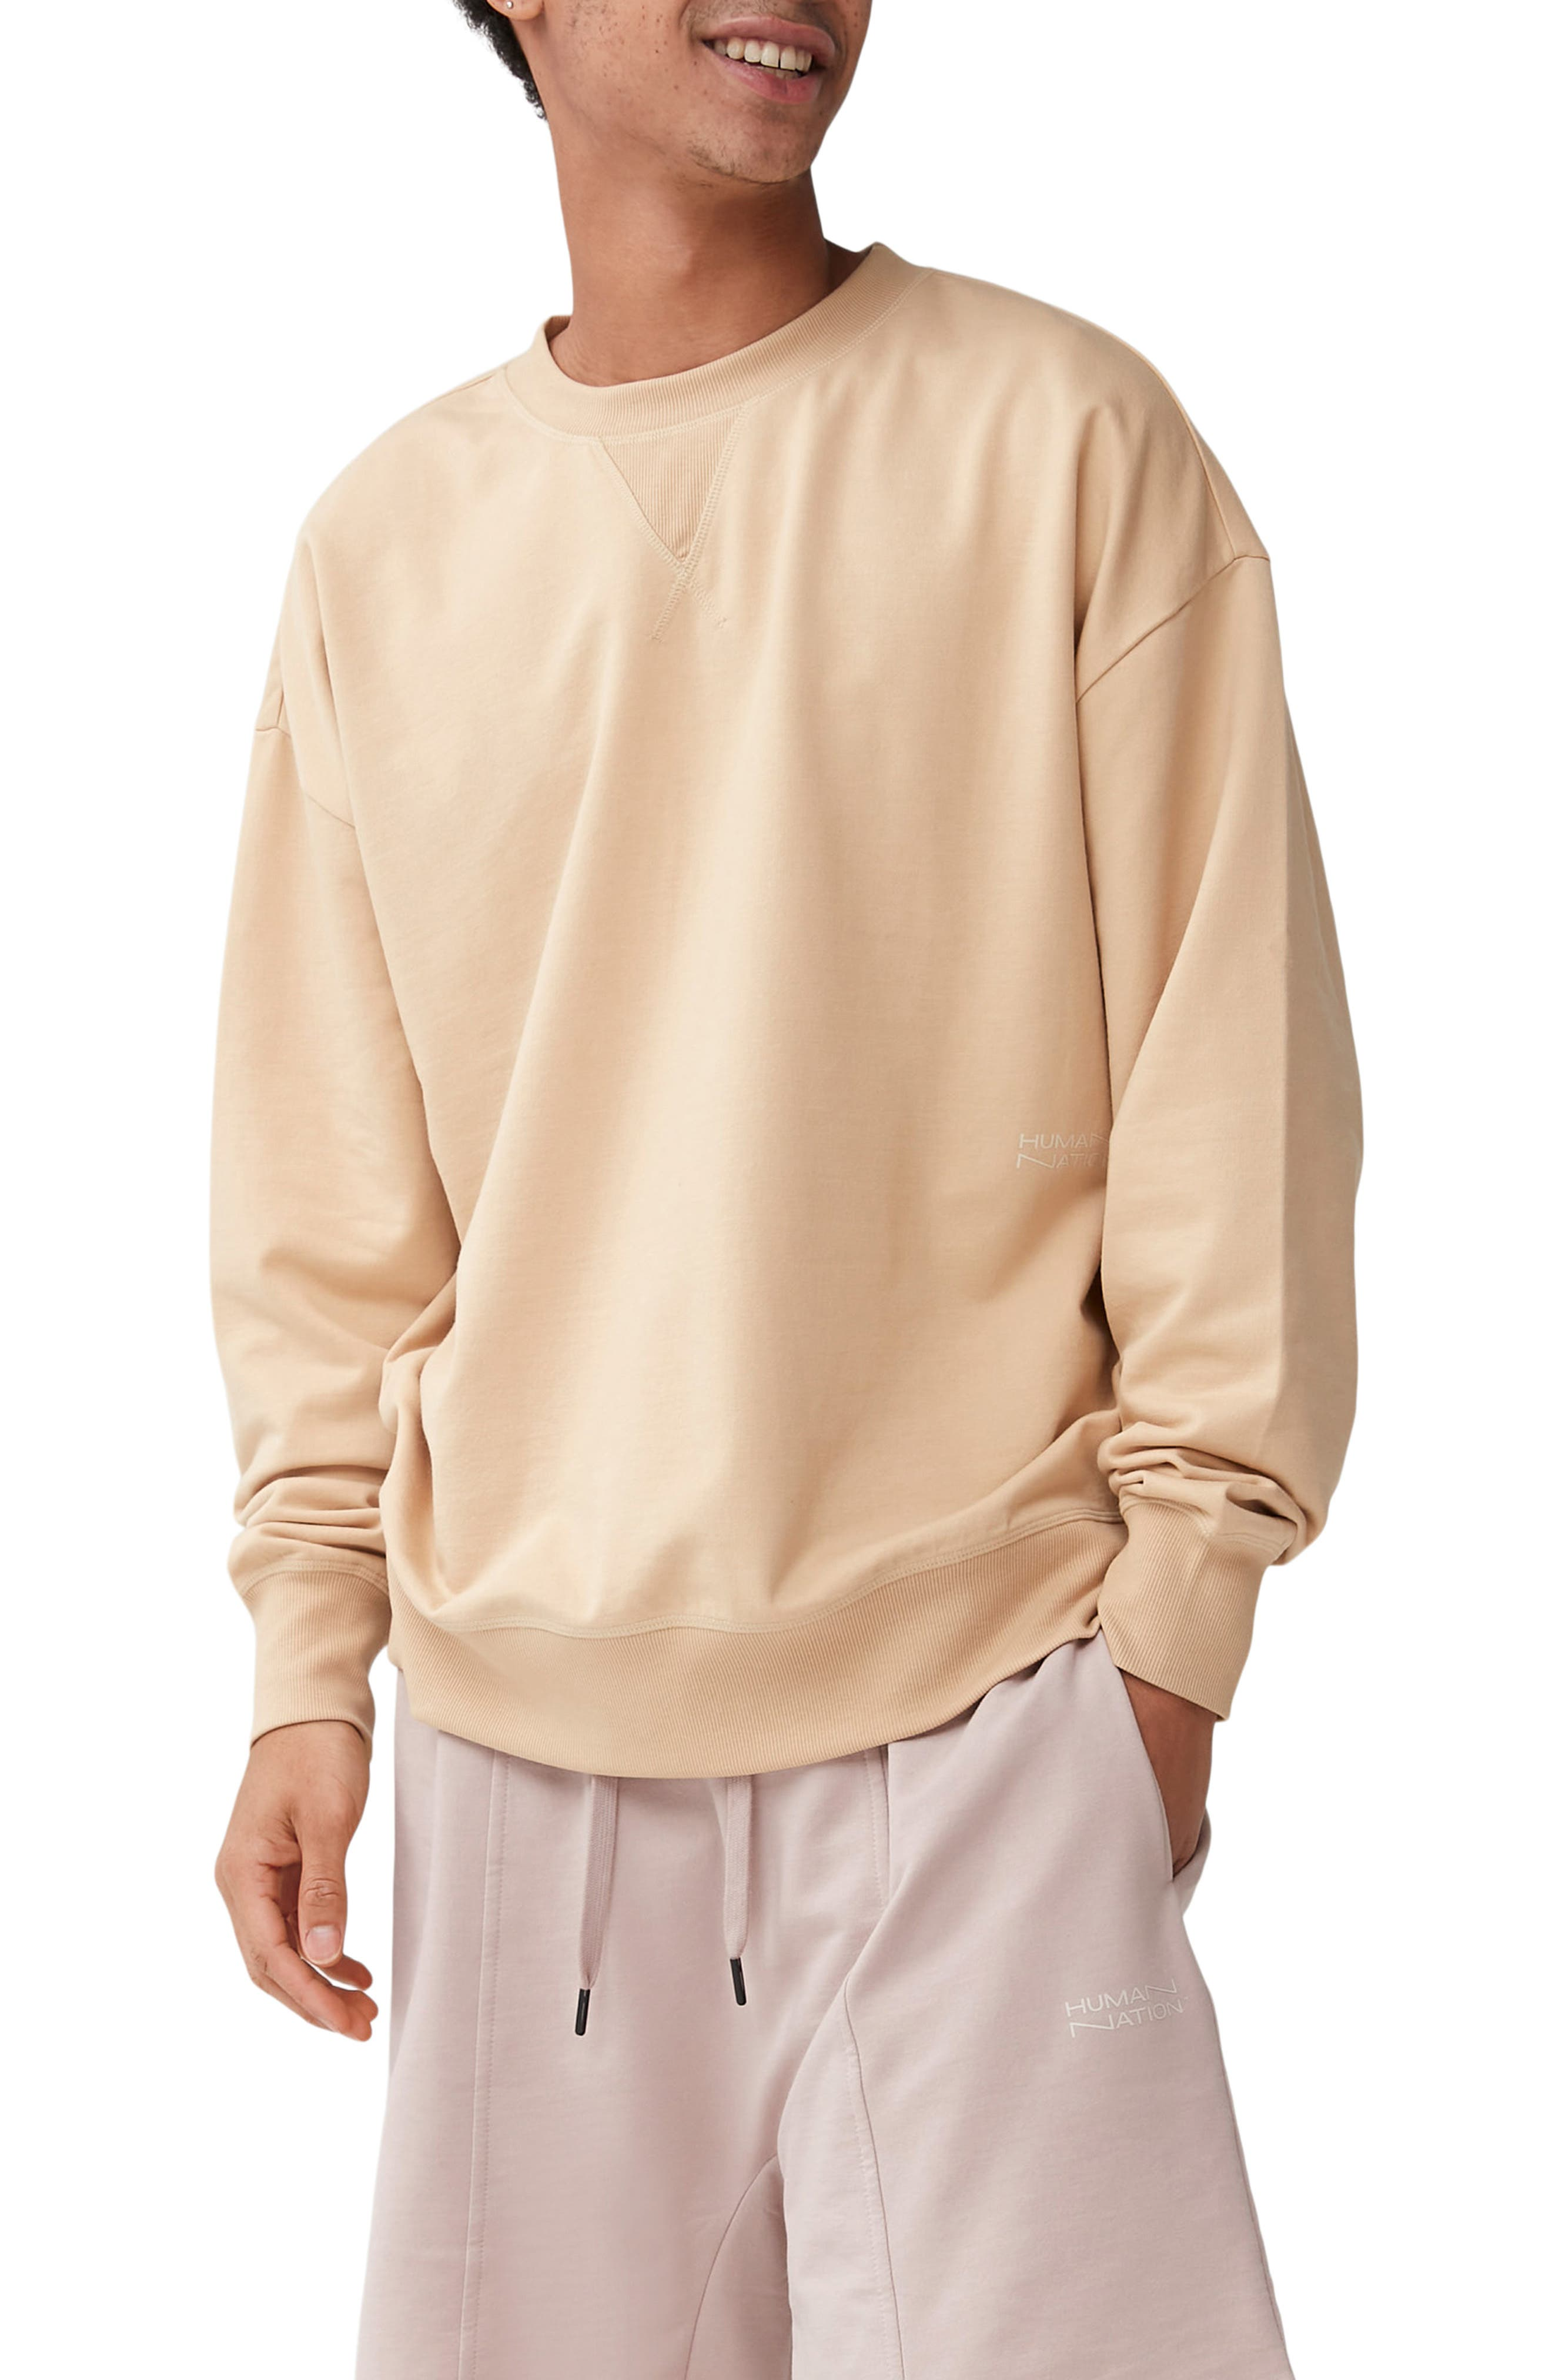 Gender Inclusive Organic Cotton Blend Crewneck Sweatshirt